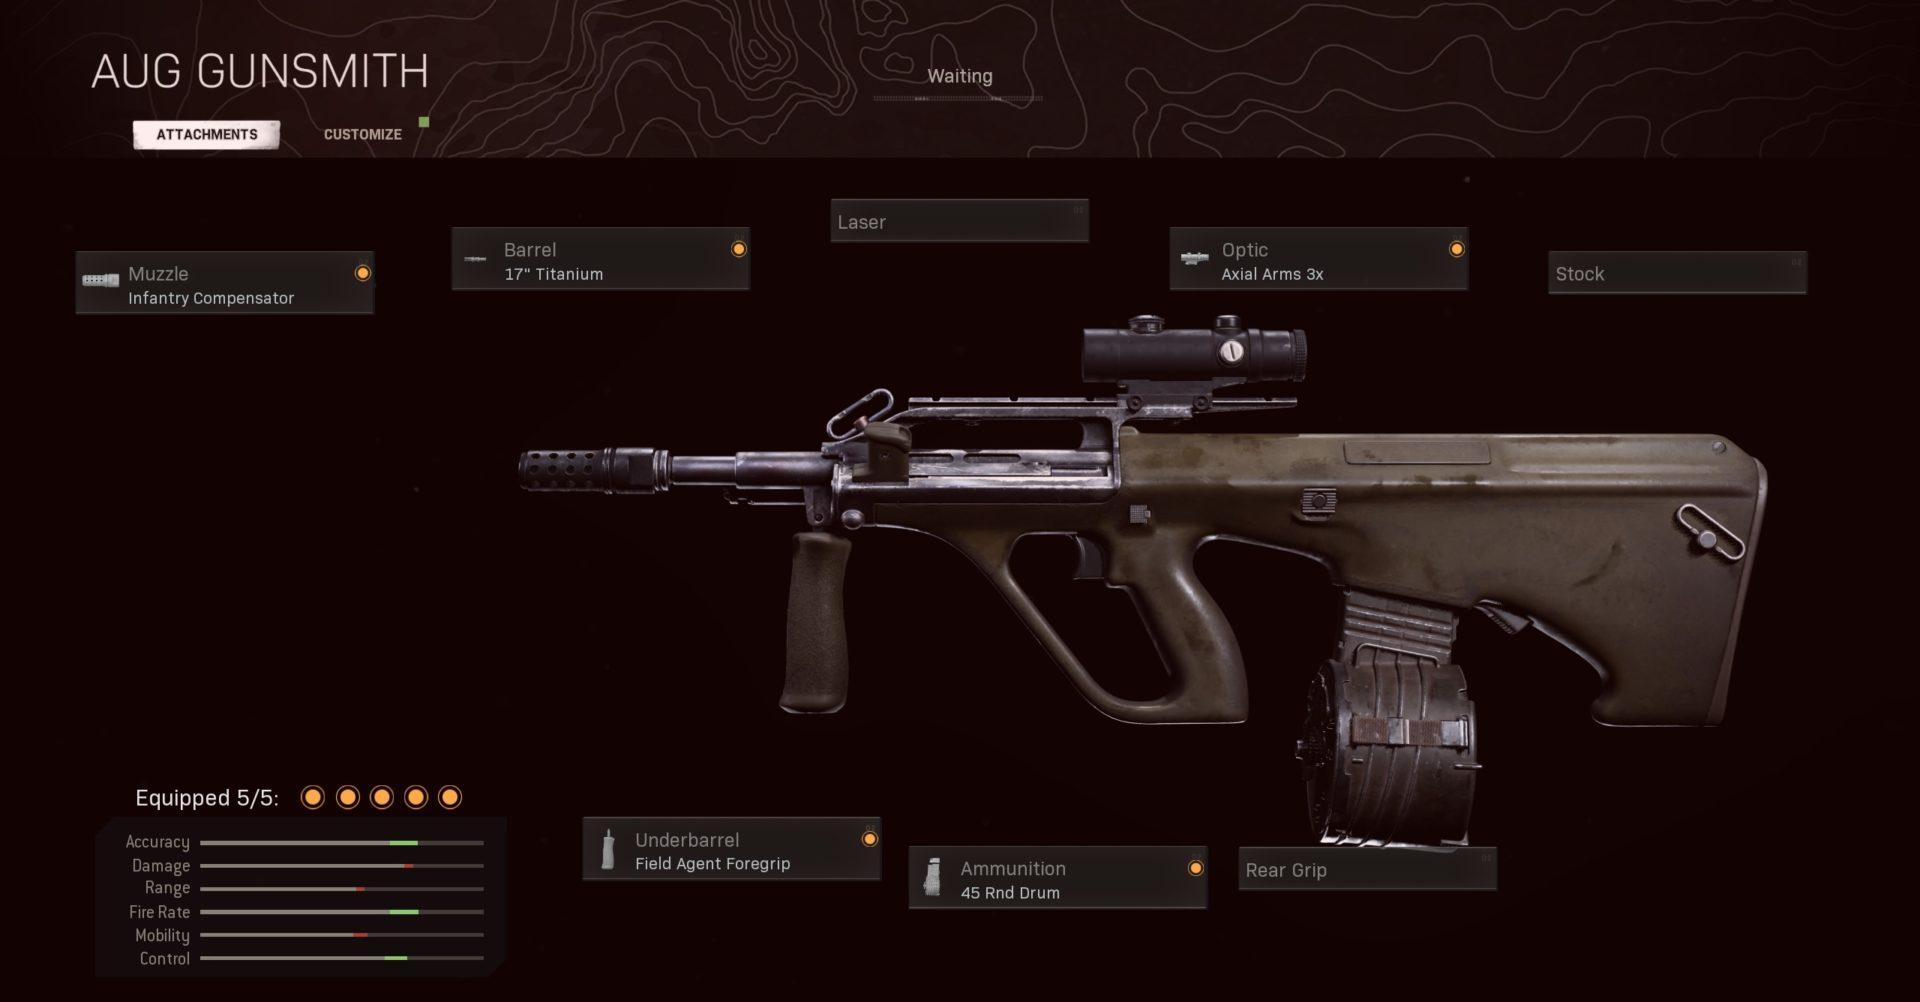 Black Ops Cold War AUG